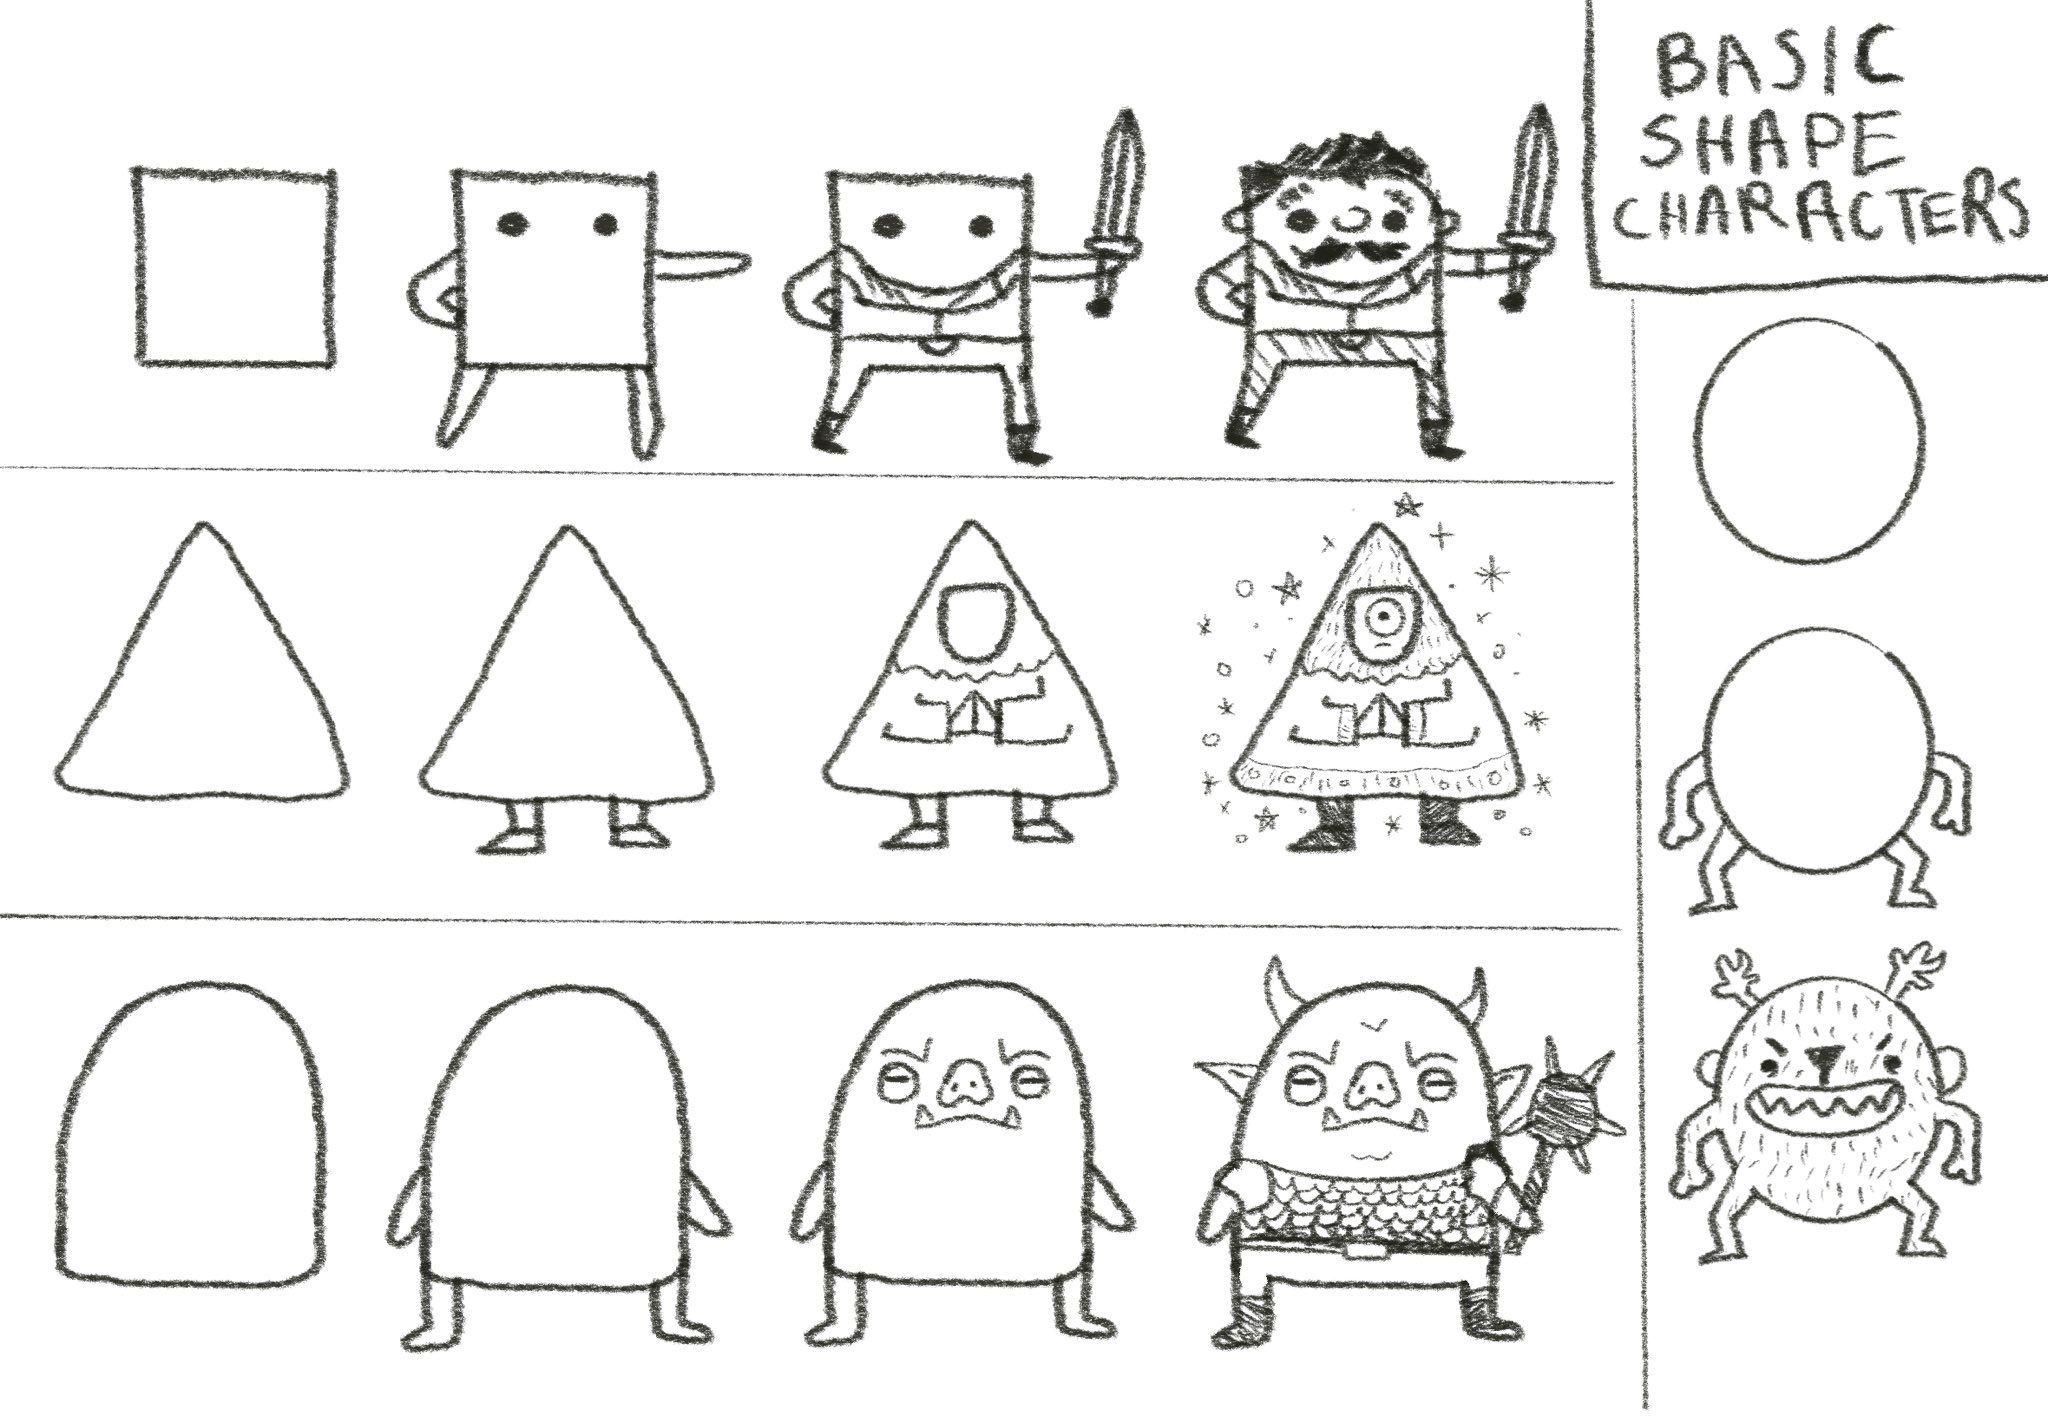 Basic Shape Characters